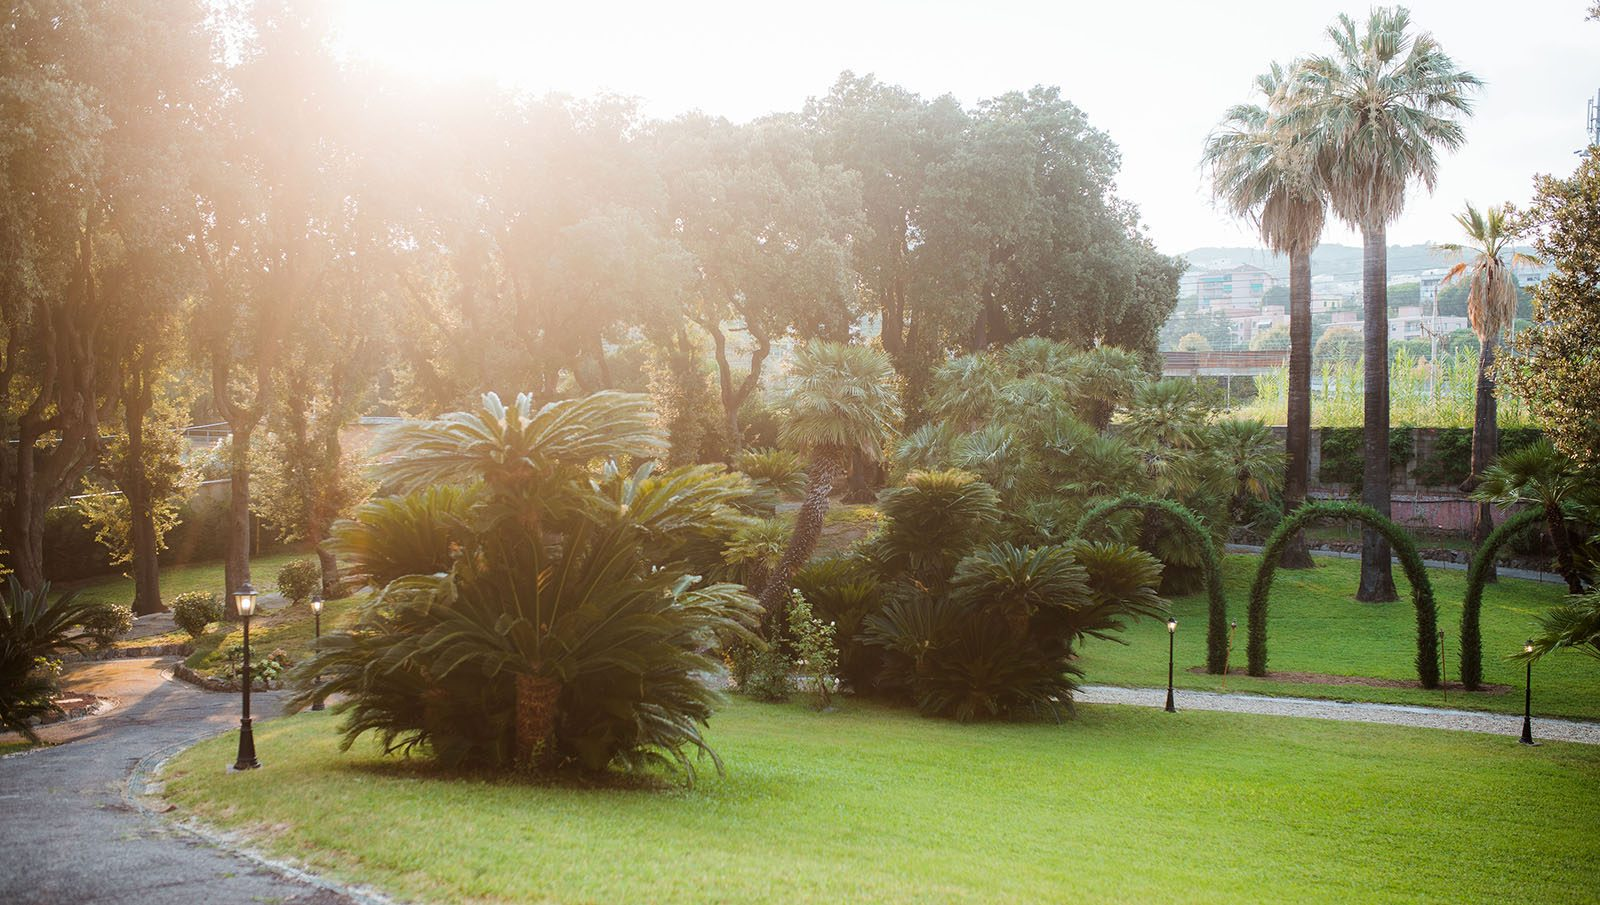 la spagnula gavotti - il giardino